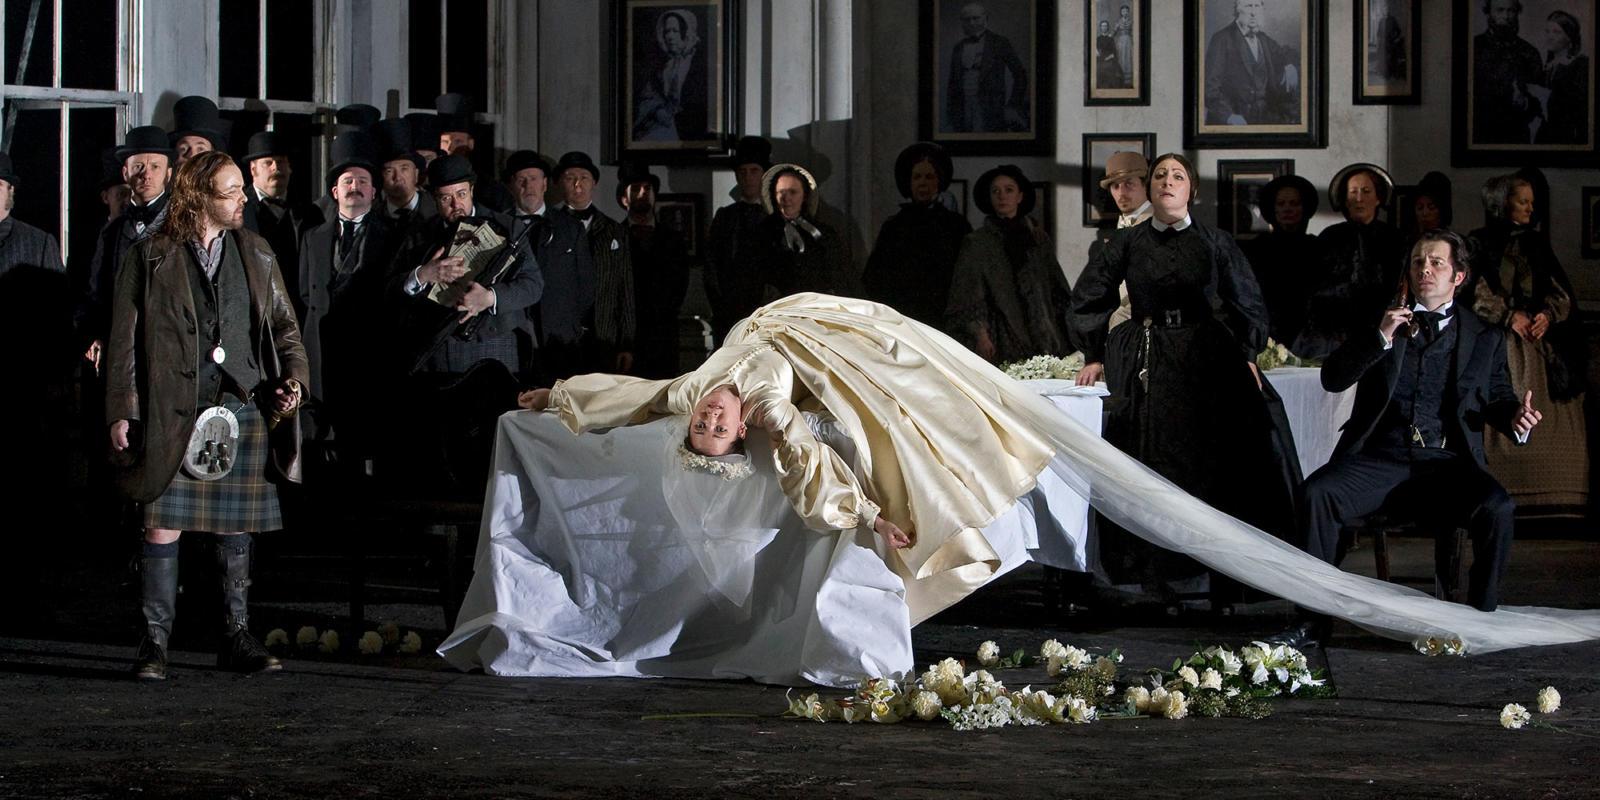 ENO Lucia di Lammermoor Anna Christy Dwayne Jones and members of ENO Chorus (c) Robert Workman